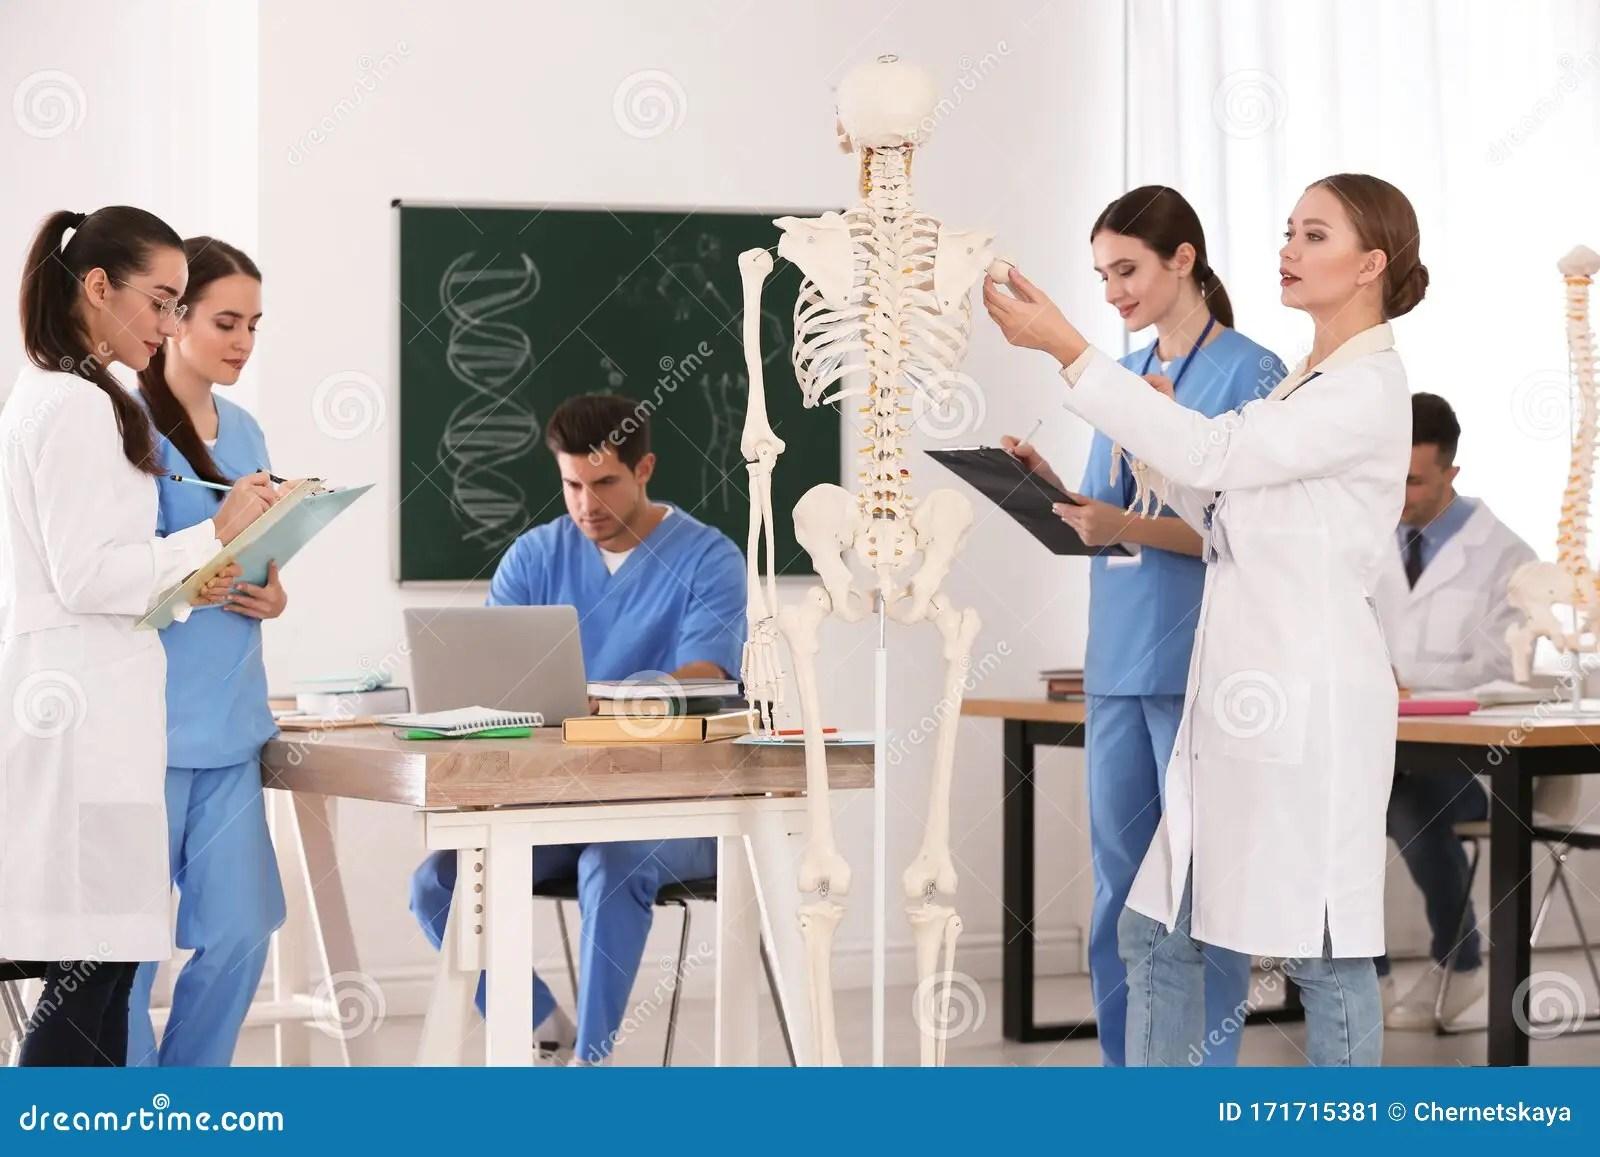 Medical Students Studying Human Skeleton Anatomy Stock